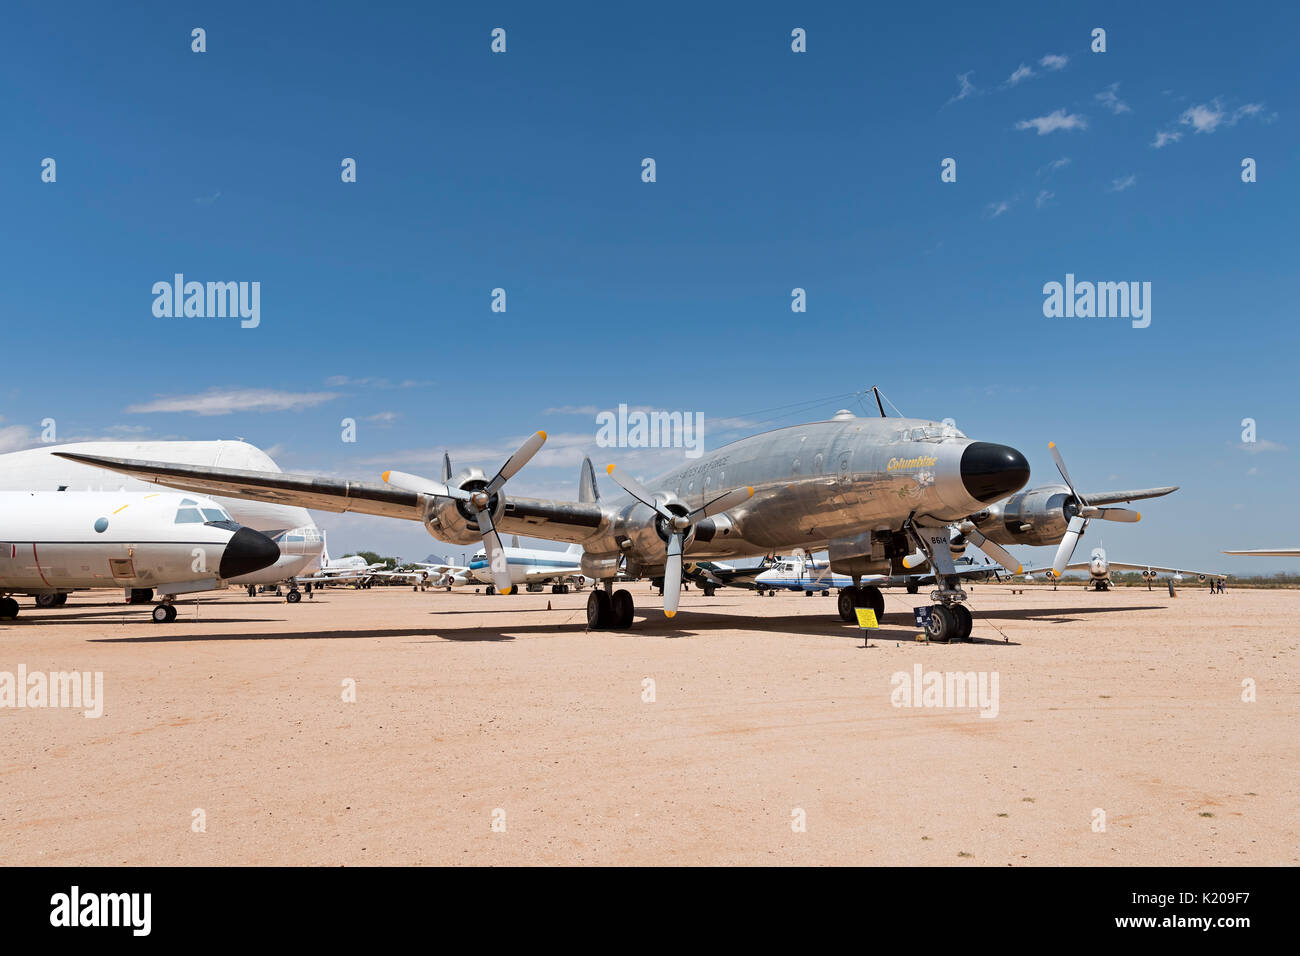 Detail with propellers, Lockheed Constellation C-1214 Columbine 1, Gen. Eisenhower's personal plane, 1950-1952 - Stock Image